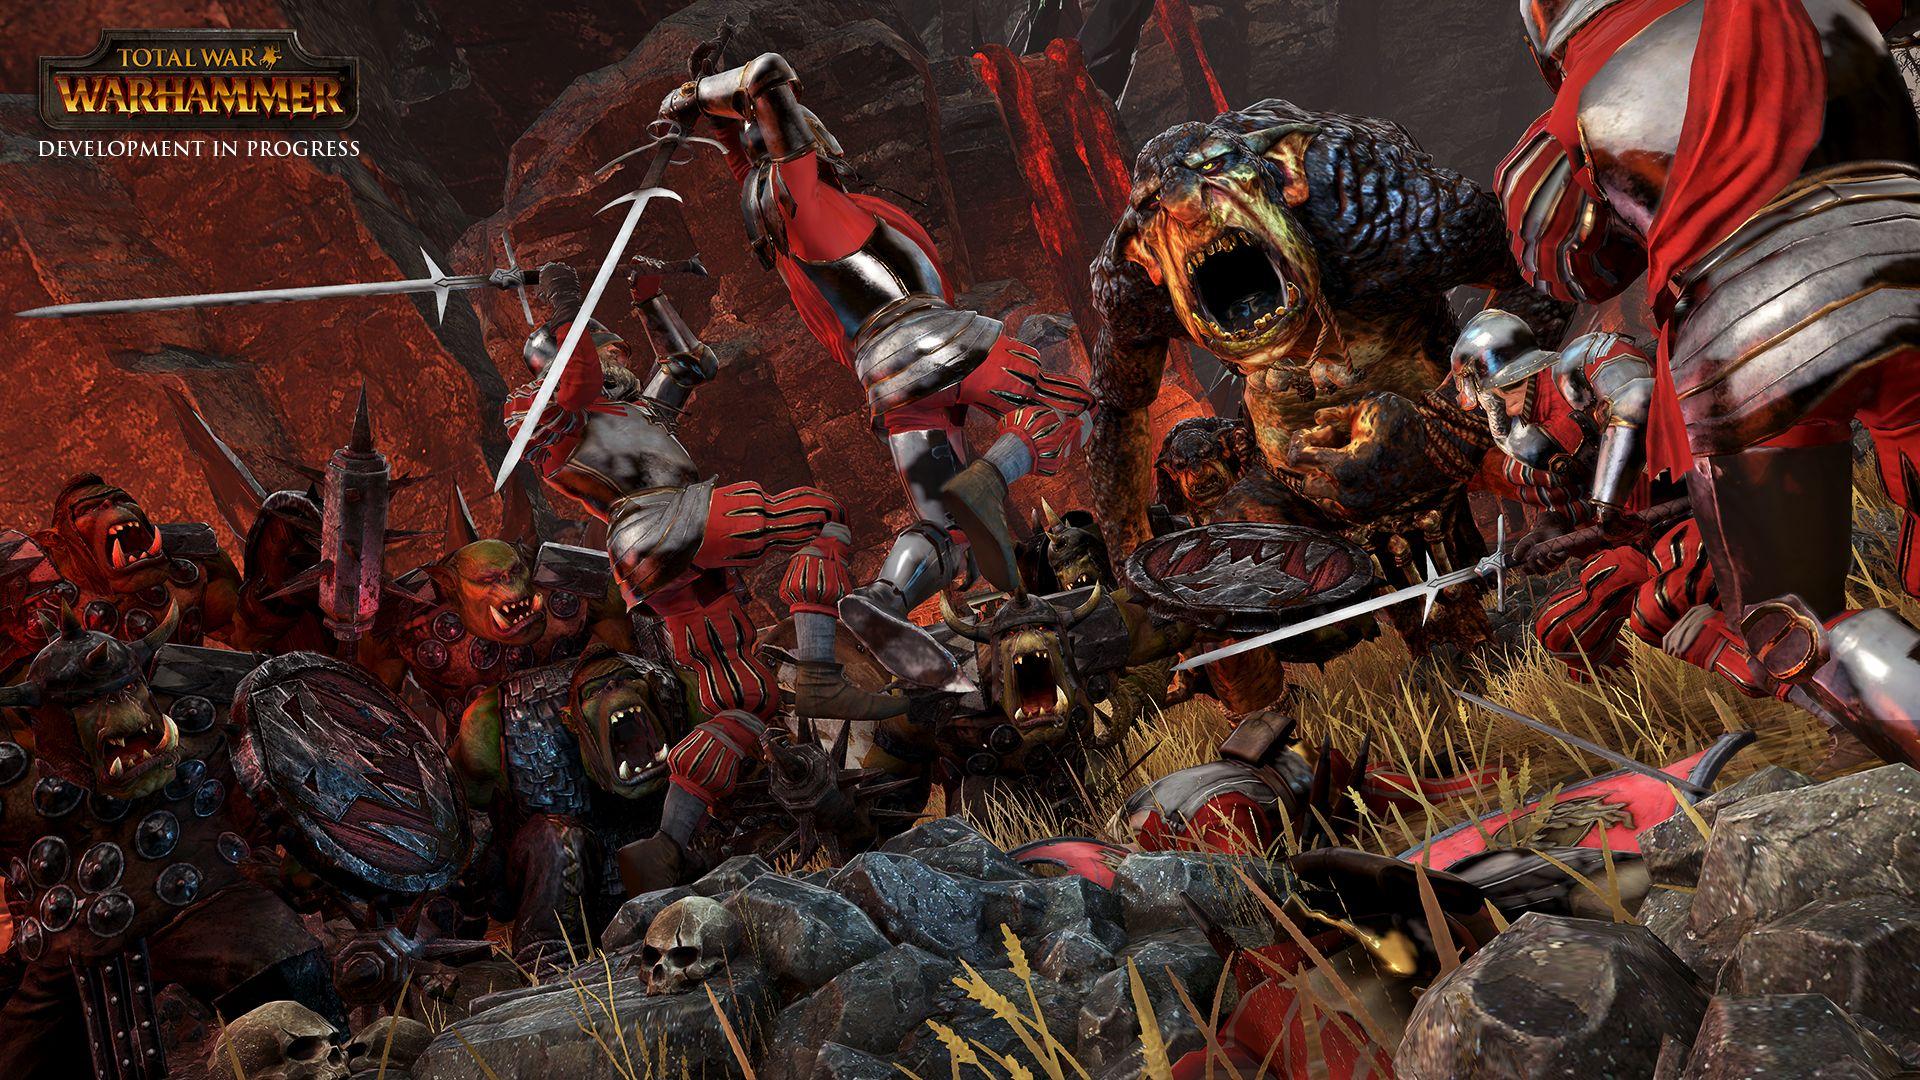 Bitva v Blackfire průsmyku z Total War: Warhammer 109633